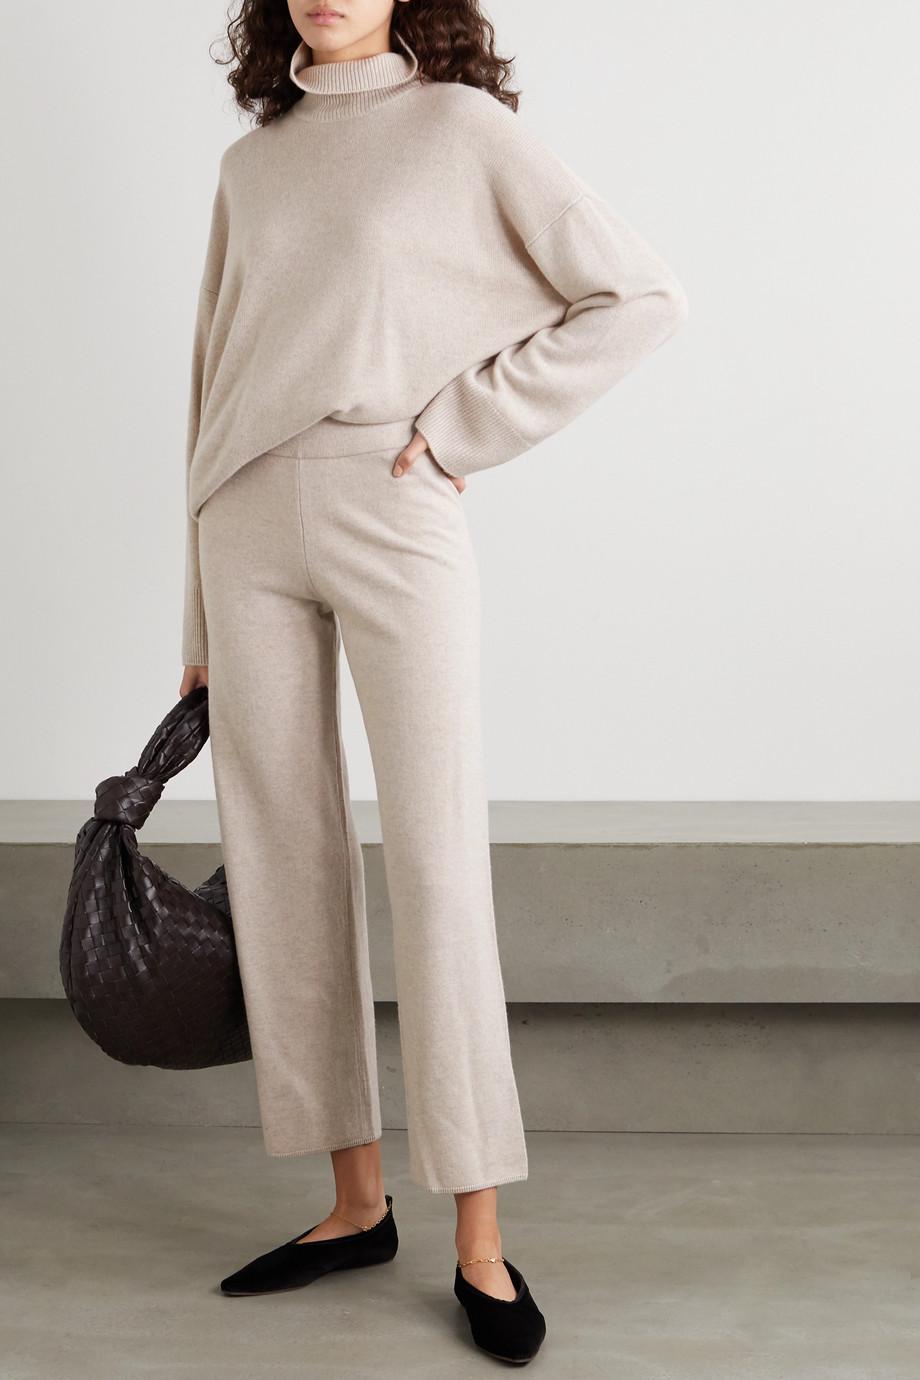 Le Kasha Ottawa cashmere straight-leg pants